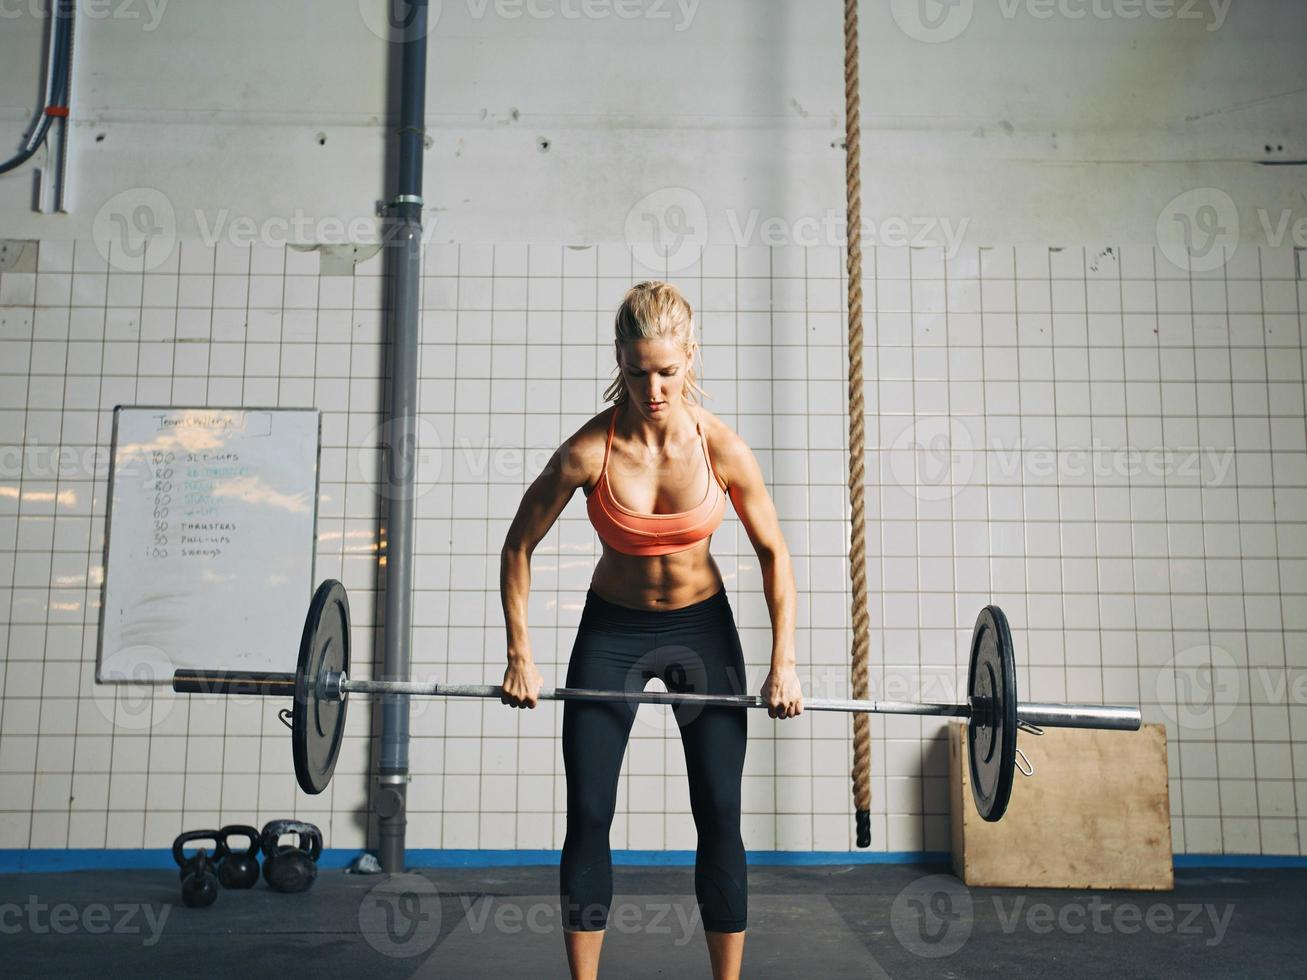 mulher de ginásio, levantamento de pesos pesados no ginásio foto